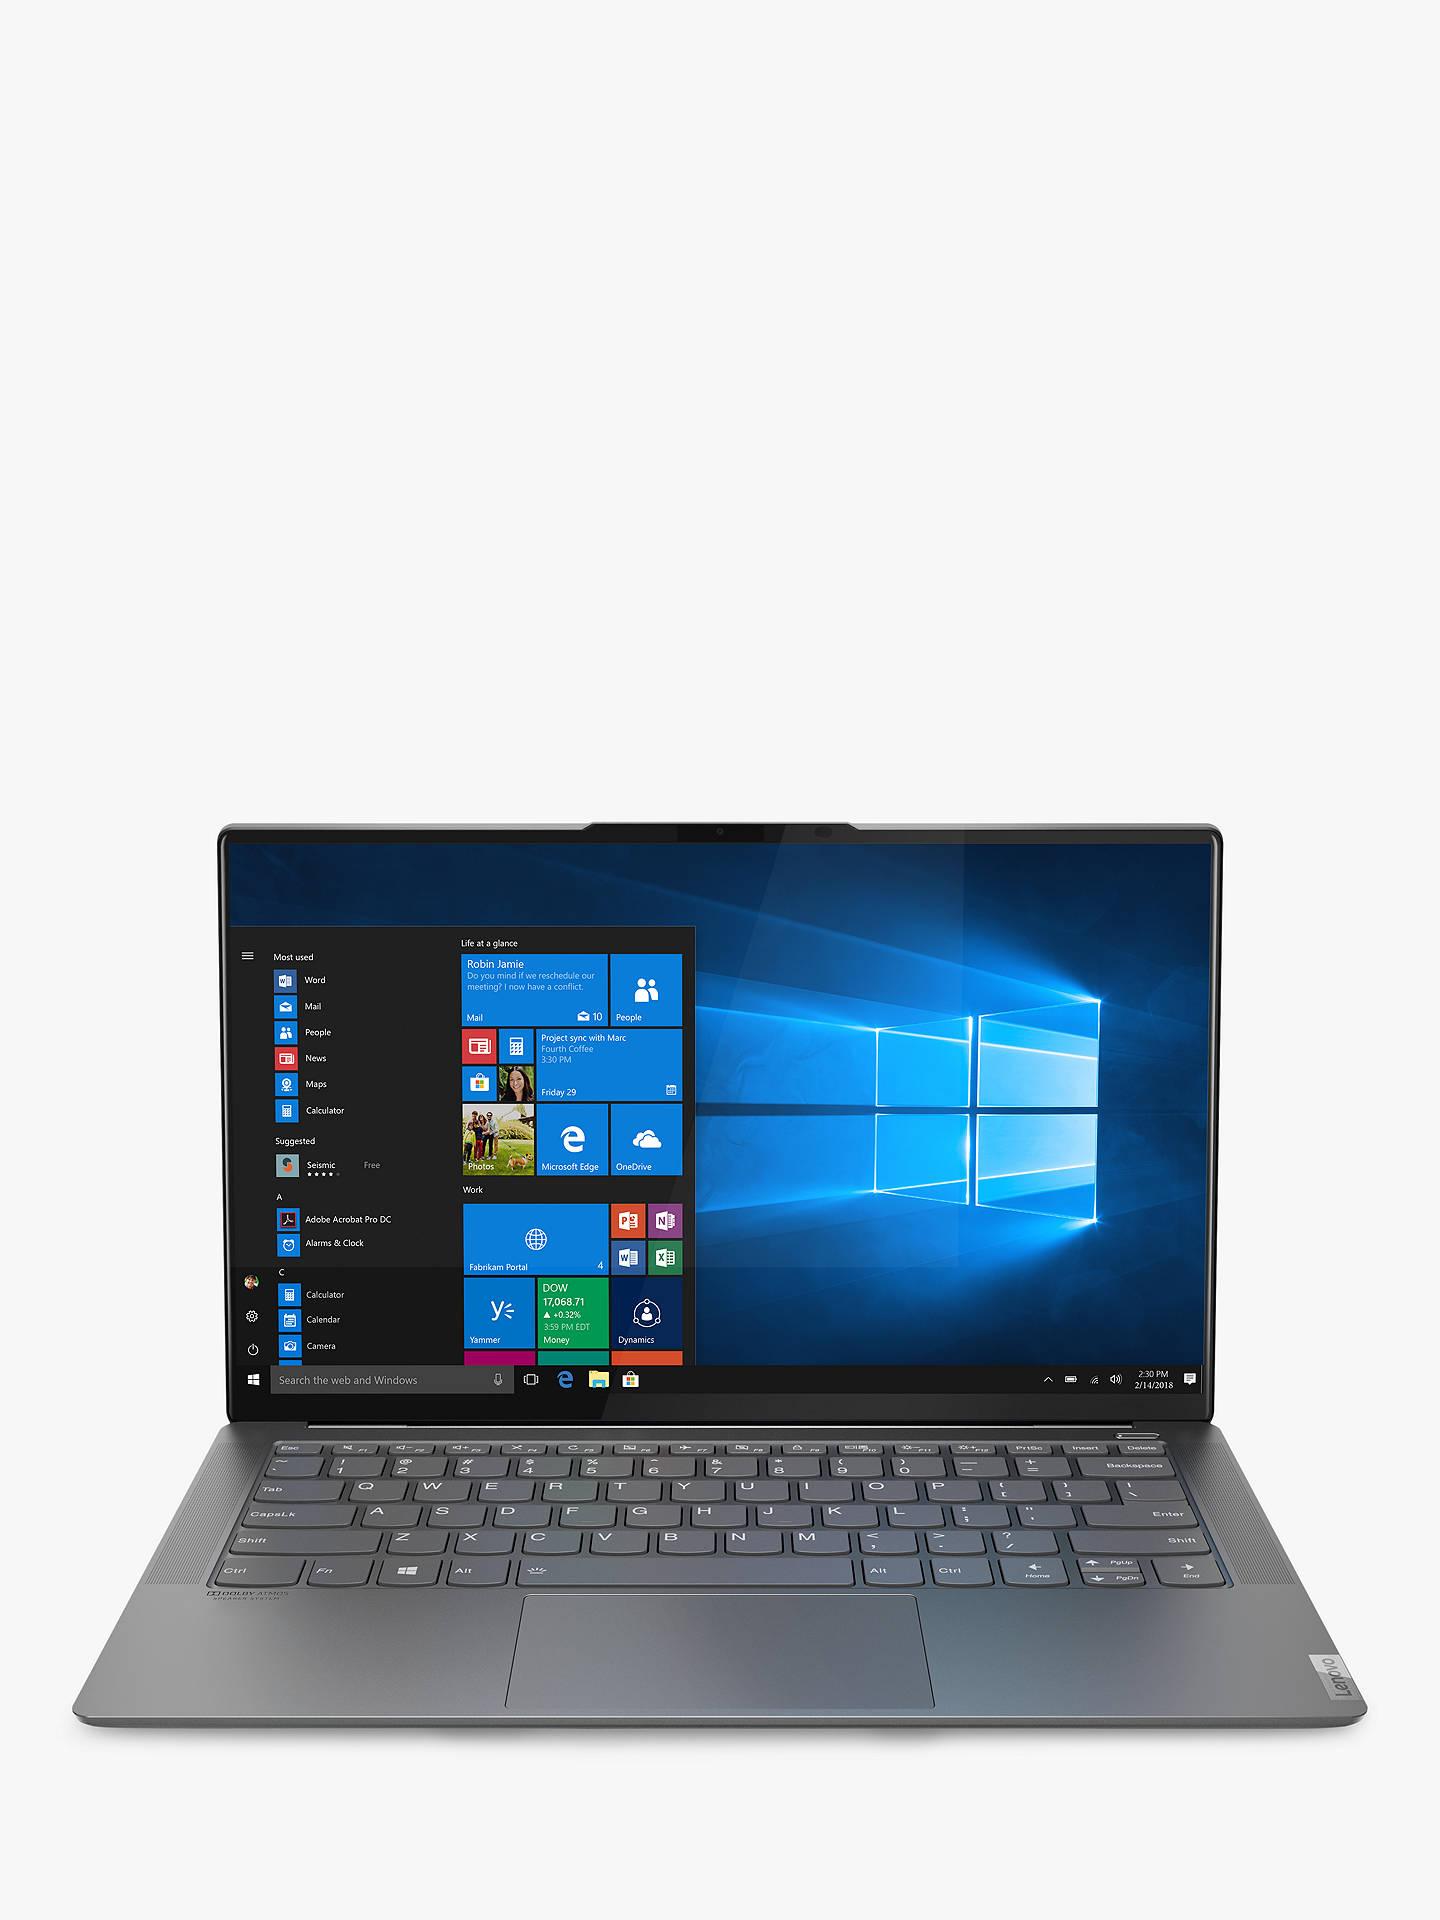 Lenovo YOGA S940-14IWL Laptop, Intel Core i7 Processor, 16GB RAM, 1TB SSD,  14